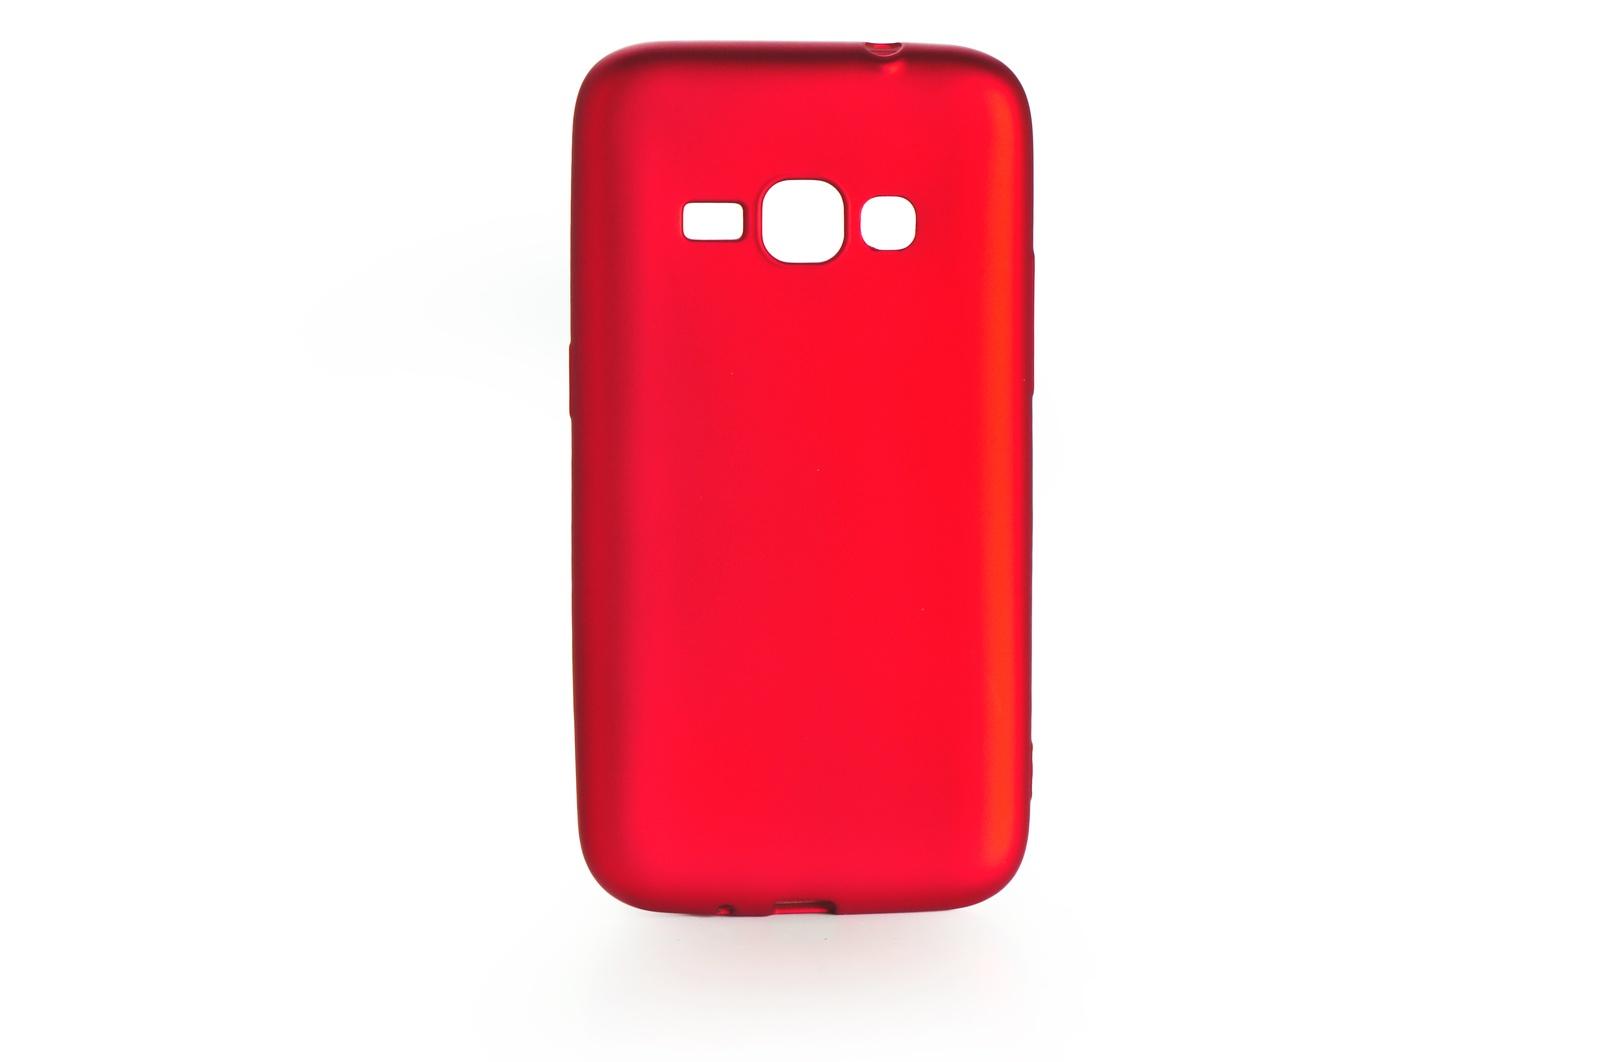 Чехол для сотового телефона Gurdini Чехол накладка силикон Soft Touch для Samsung Galaxy J1 2016 (J-120), 904283, красный